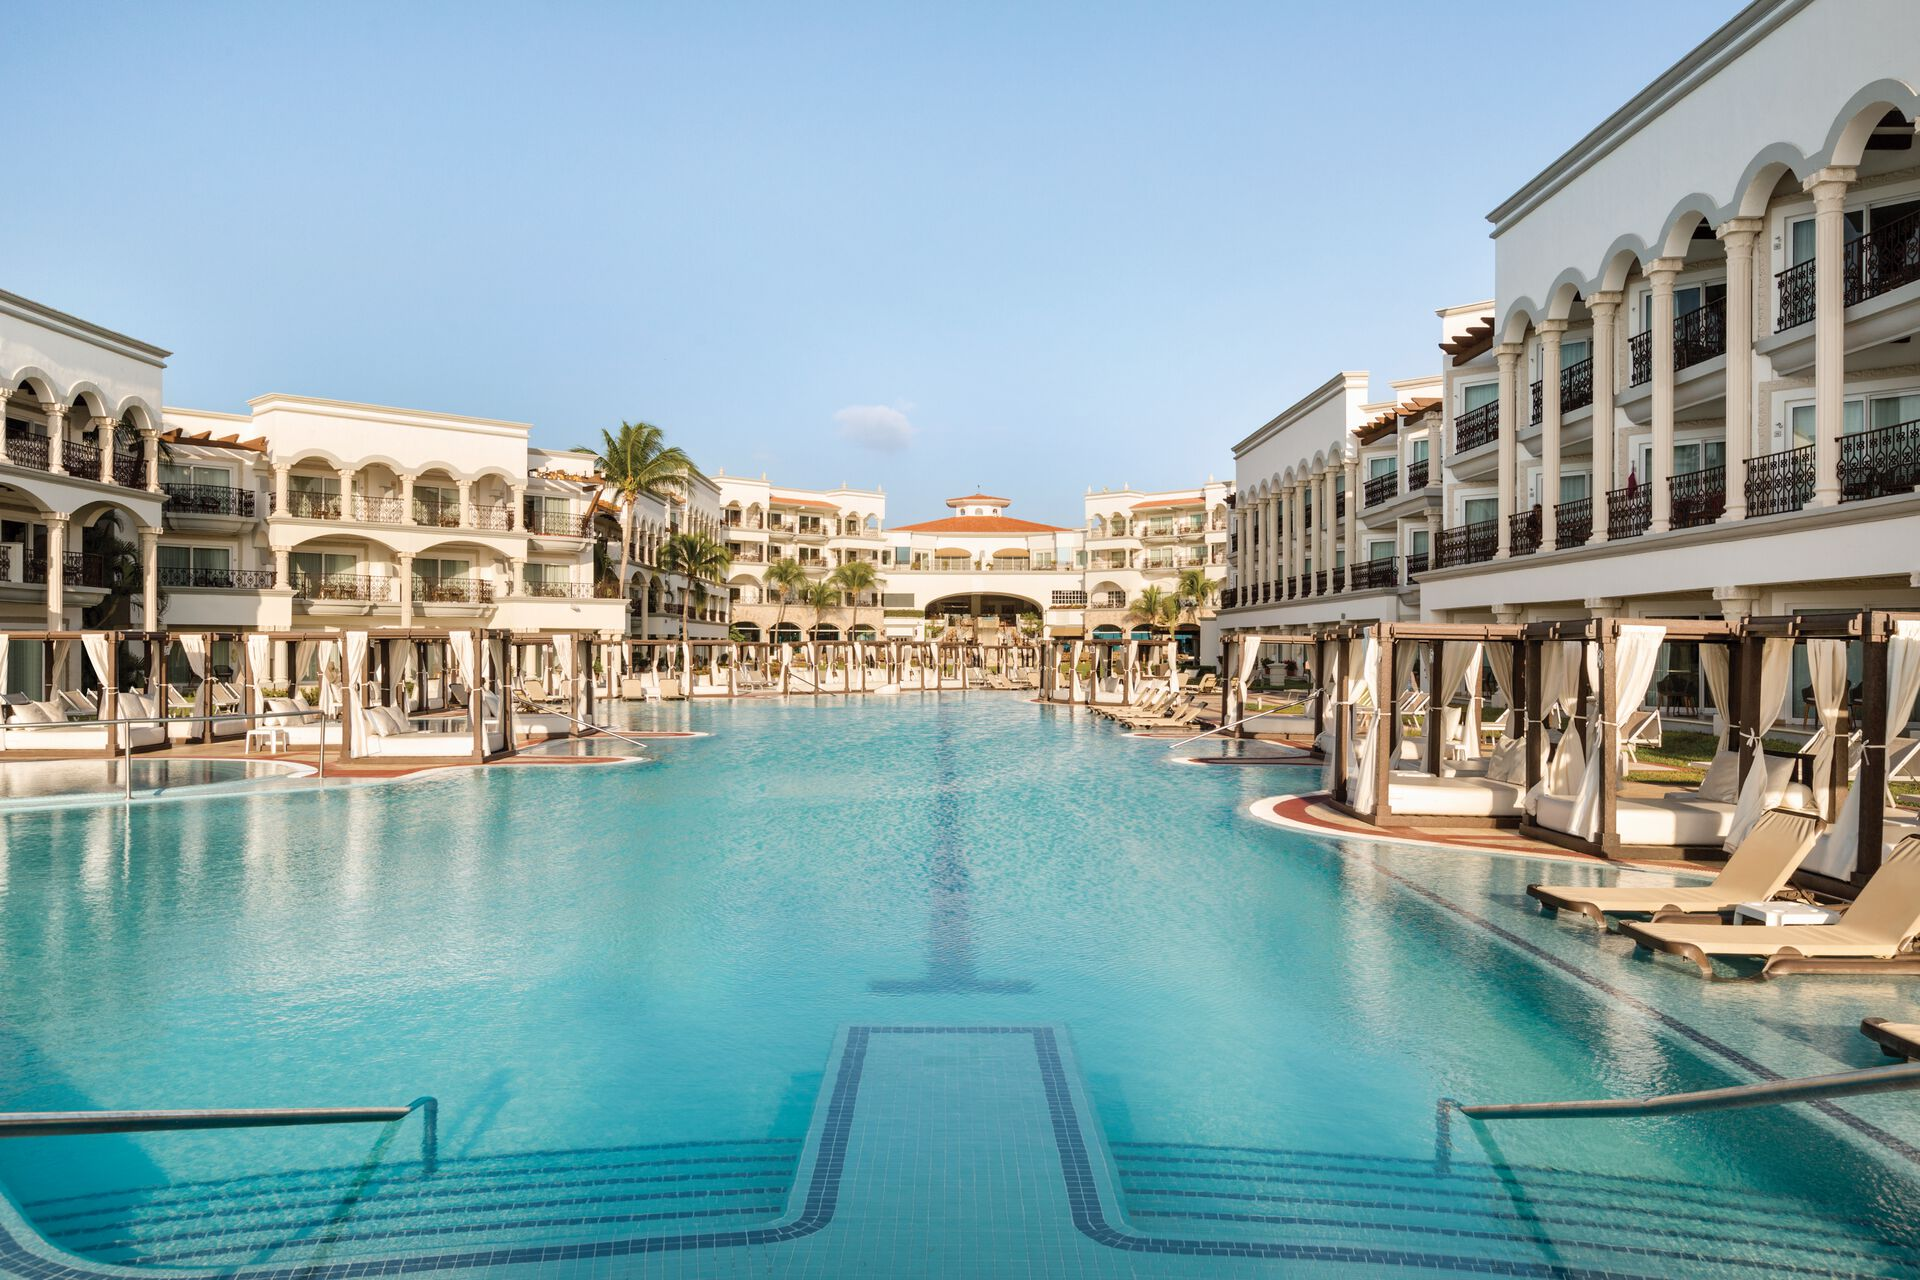 Hilton Playa del Carmen (- Adult Only) - 5*